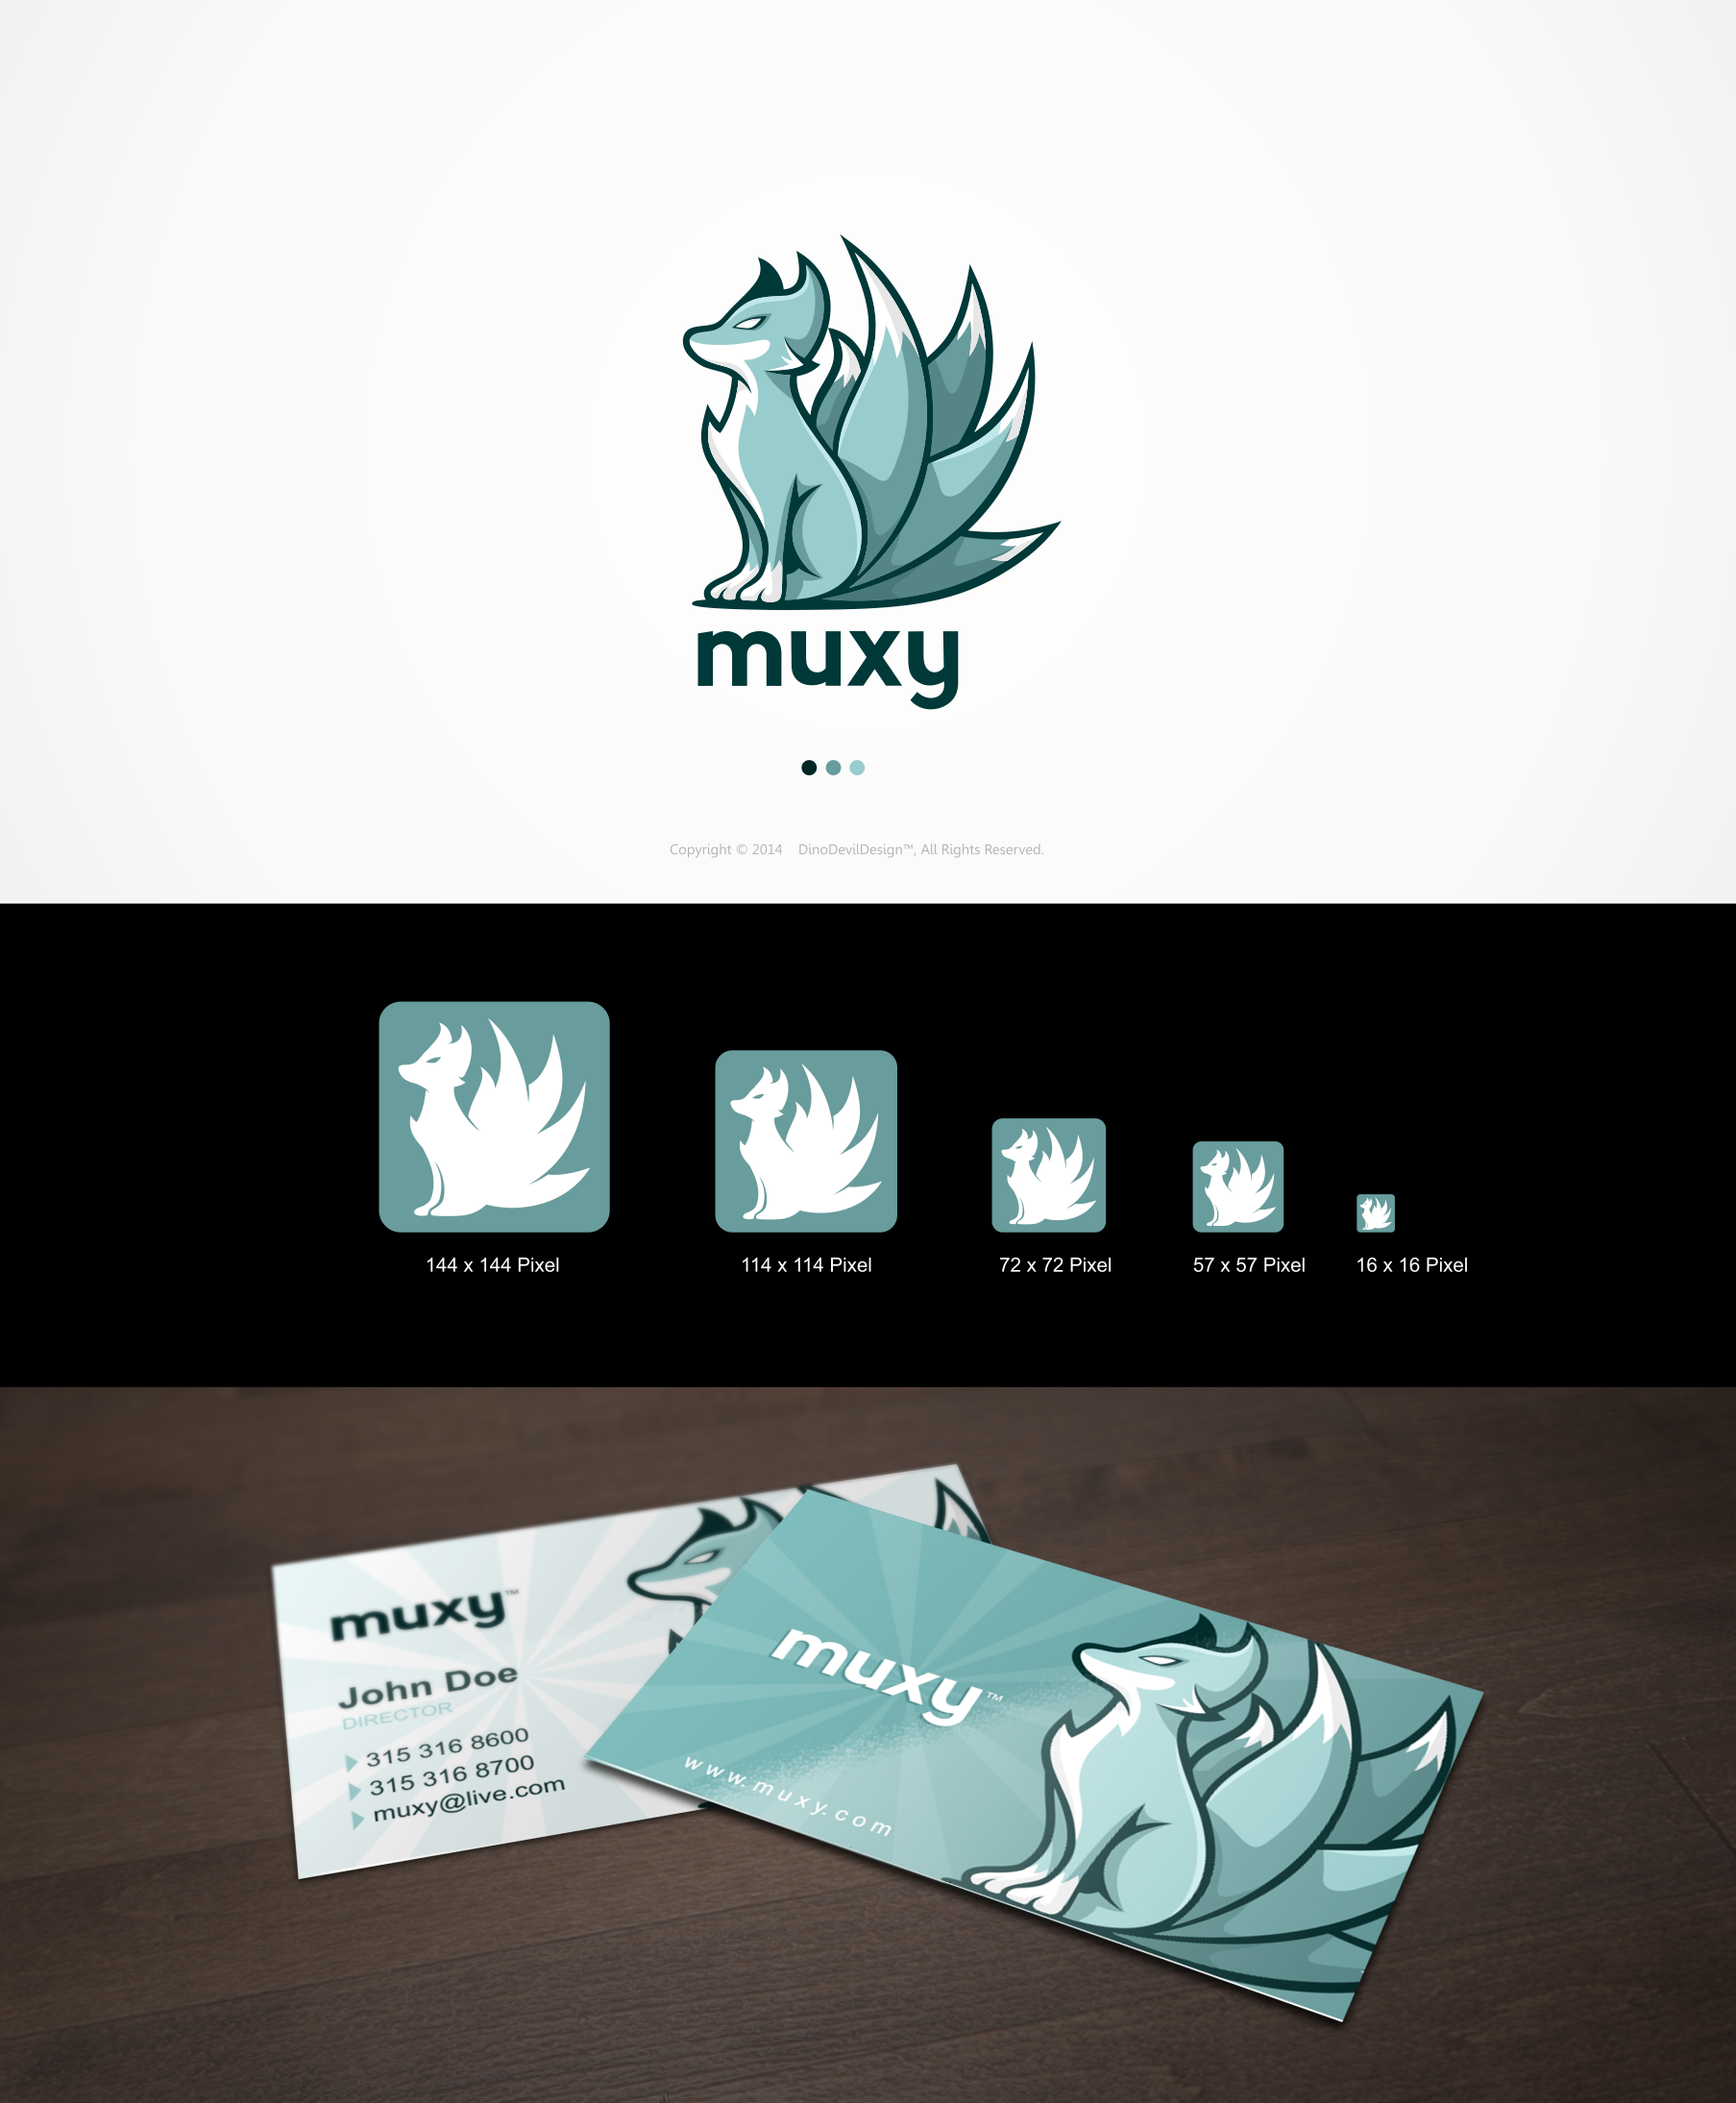 Muxy Logo and Character.